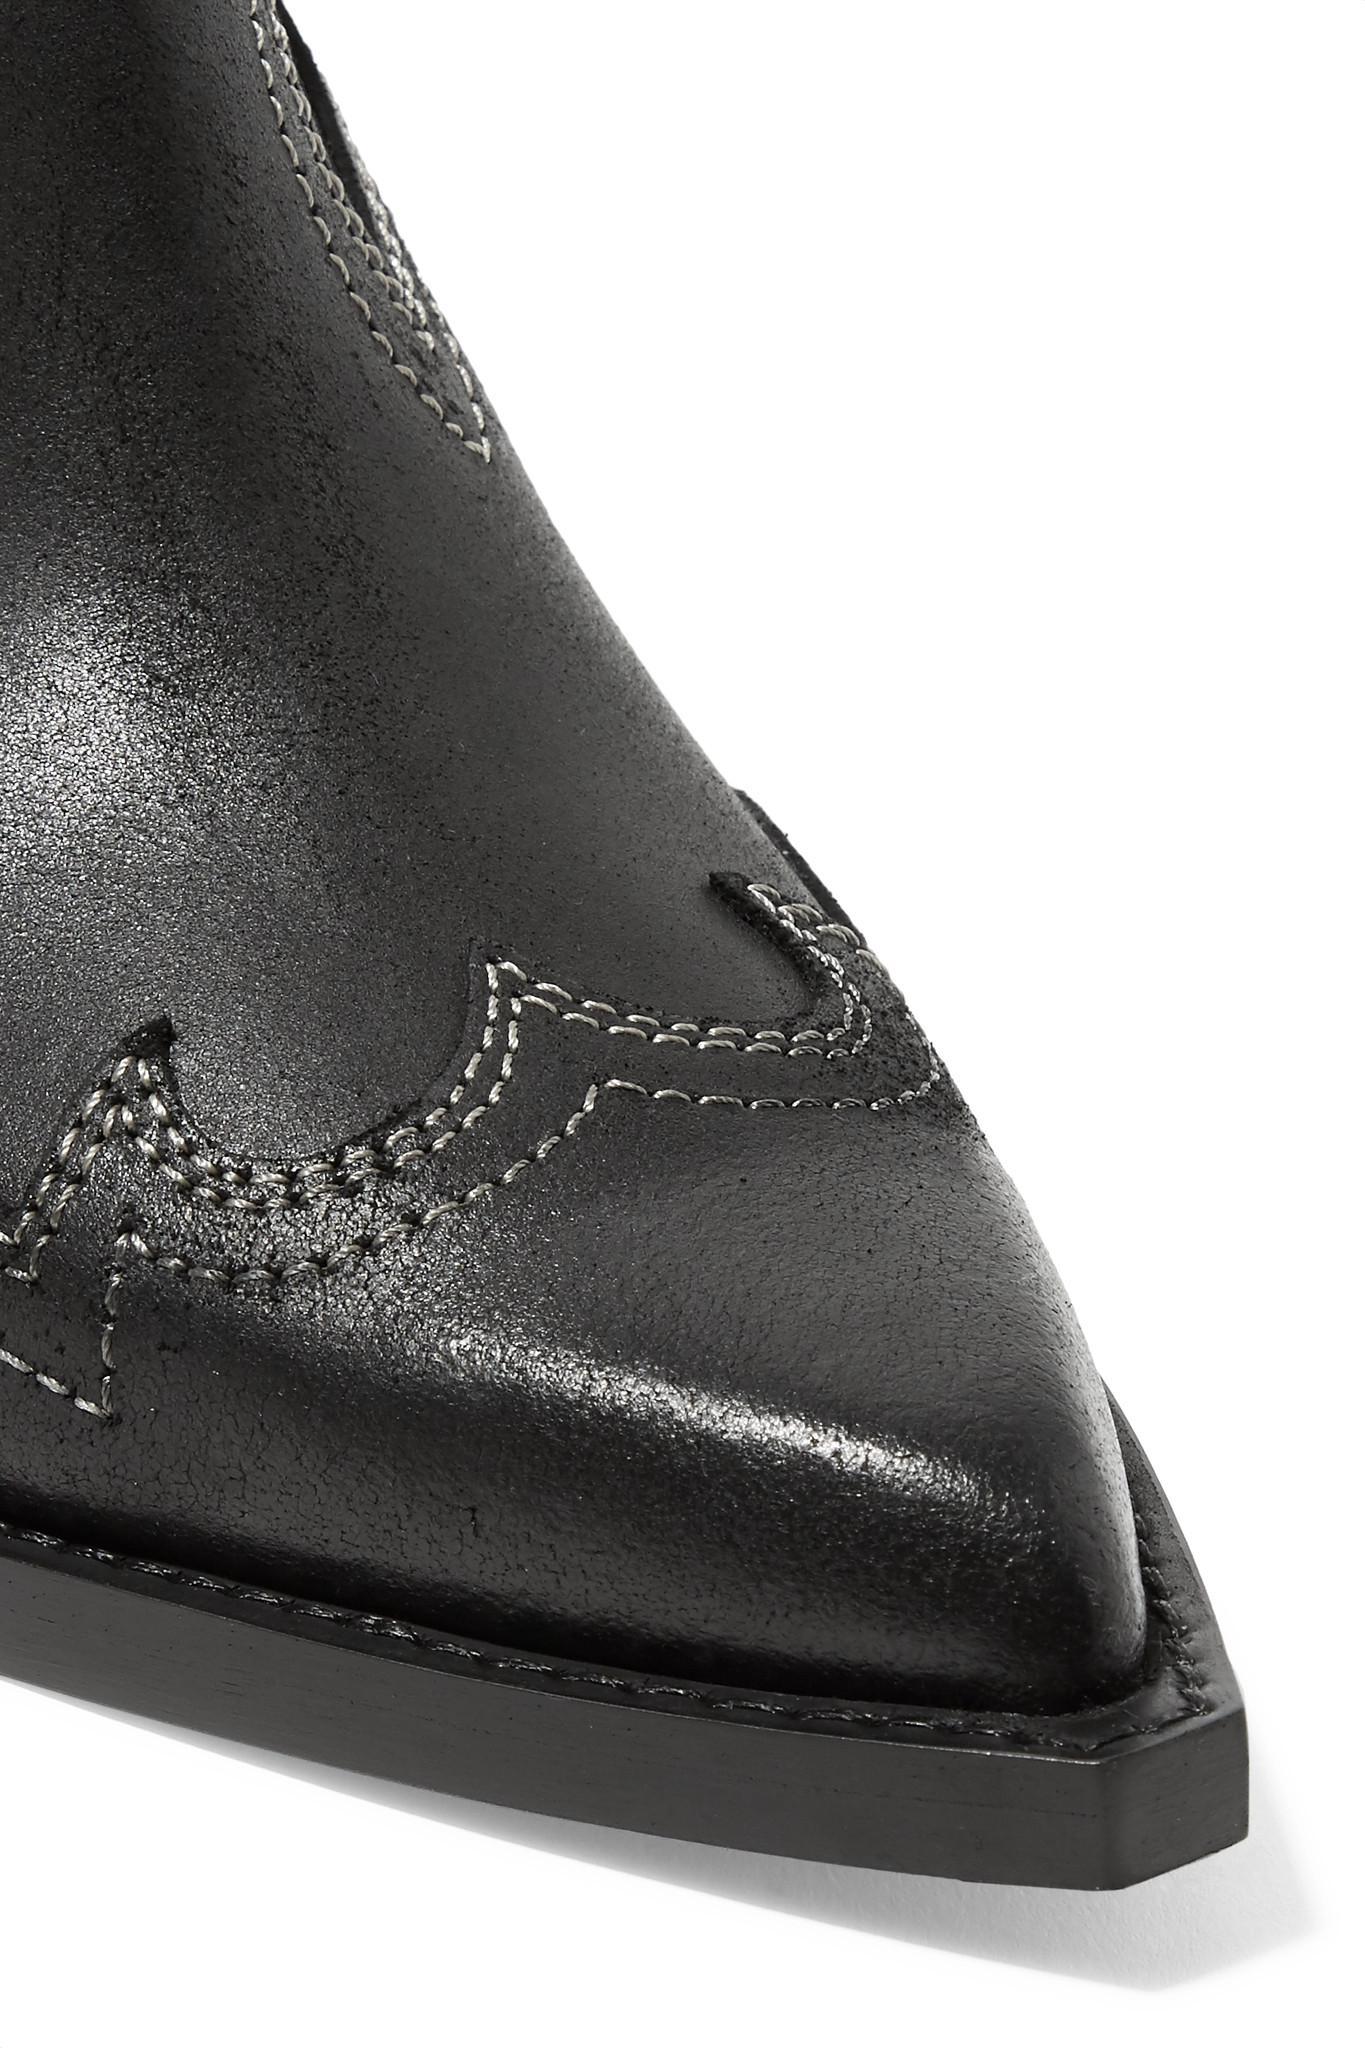 44badc1cbcb7 MM6 by Maison Martin Margiela - Black Nubuck Wedge Ankle Boots - Lyst. View  fullscreen